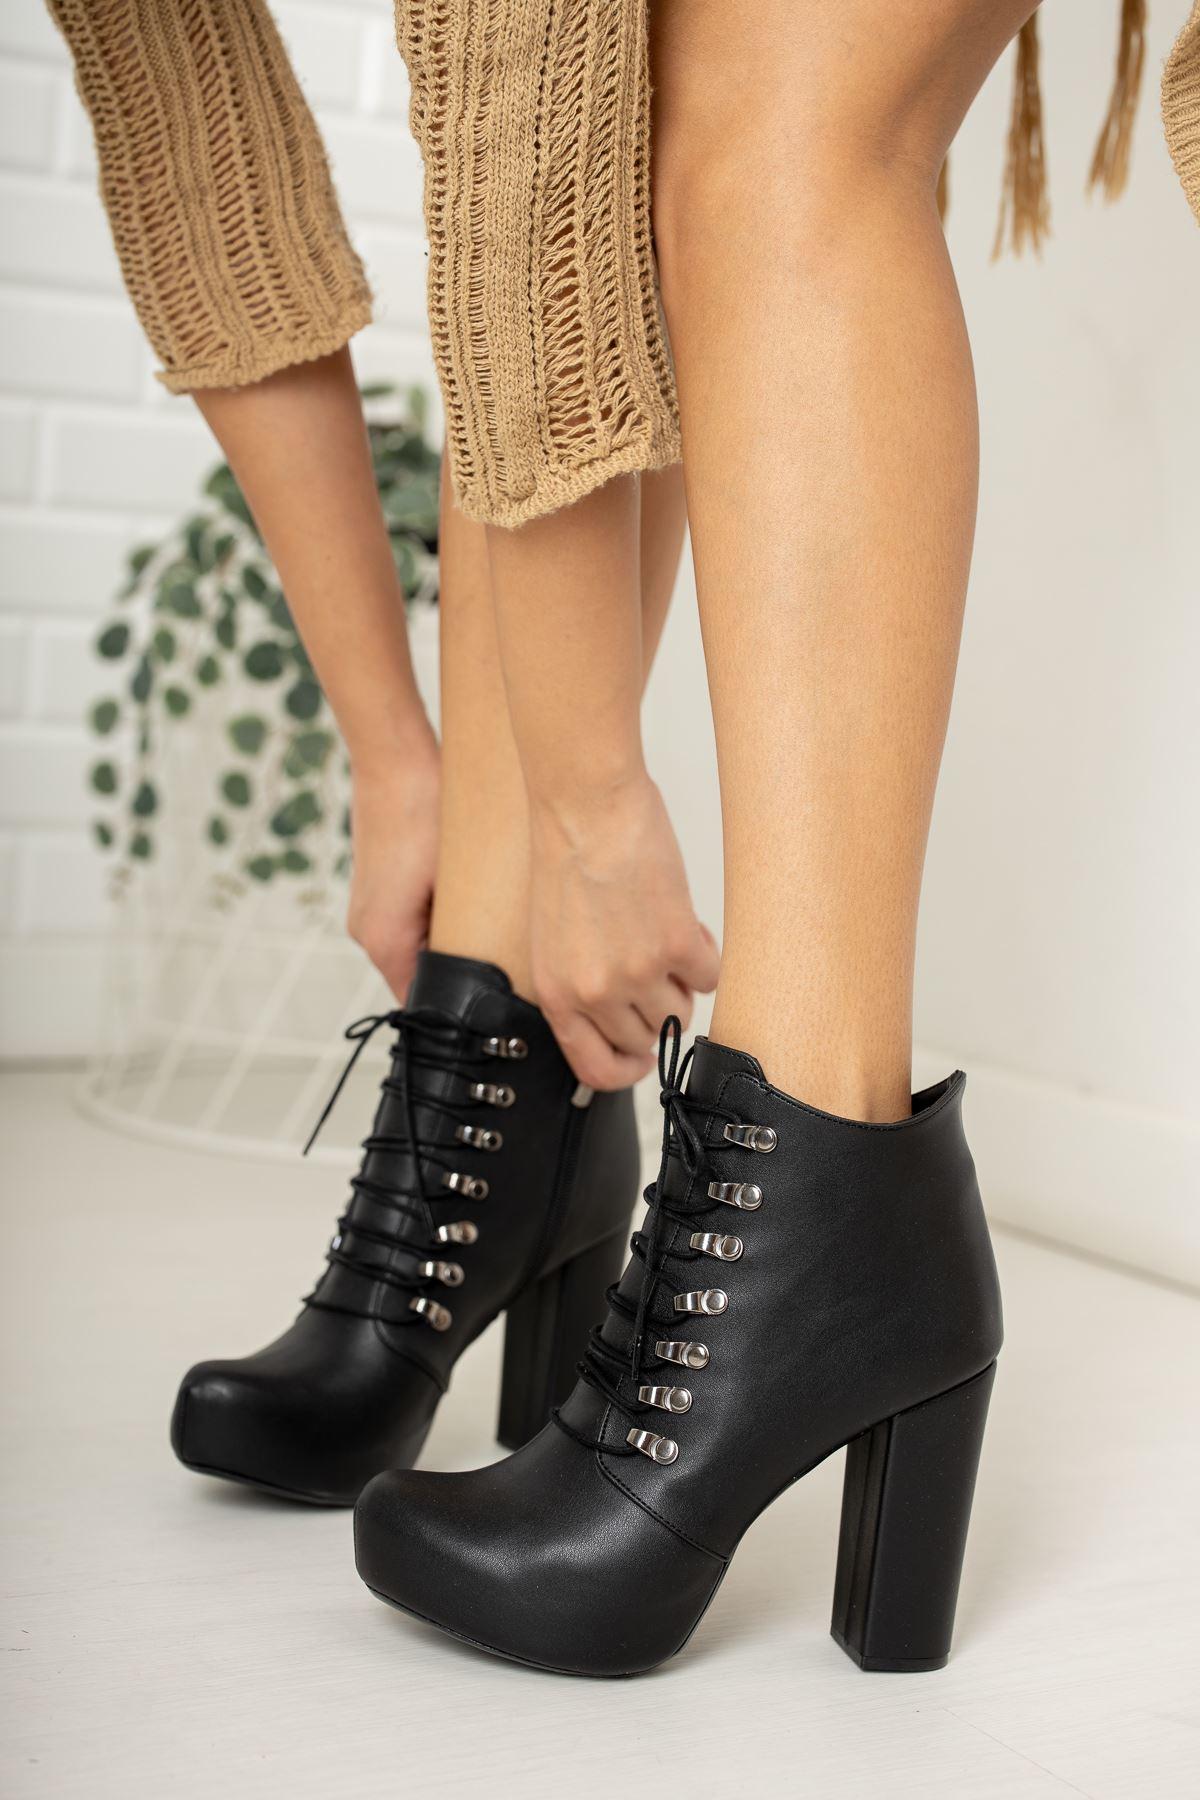 Siyah Cilt Kancalı Platform Topuklu Ayakkabı